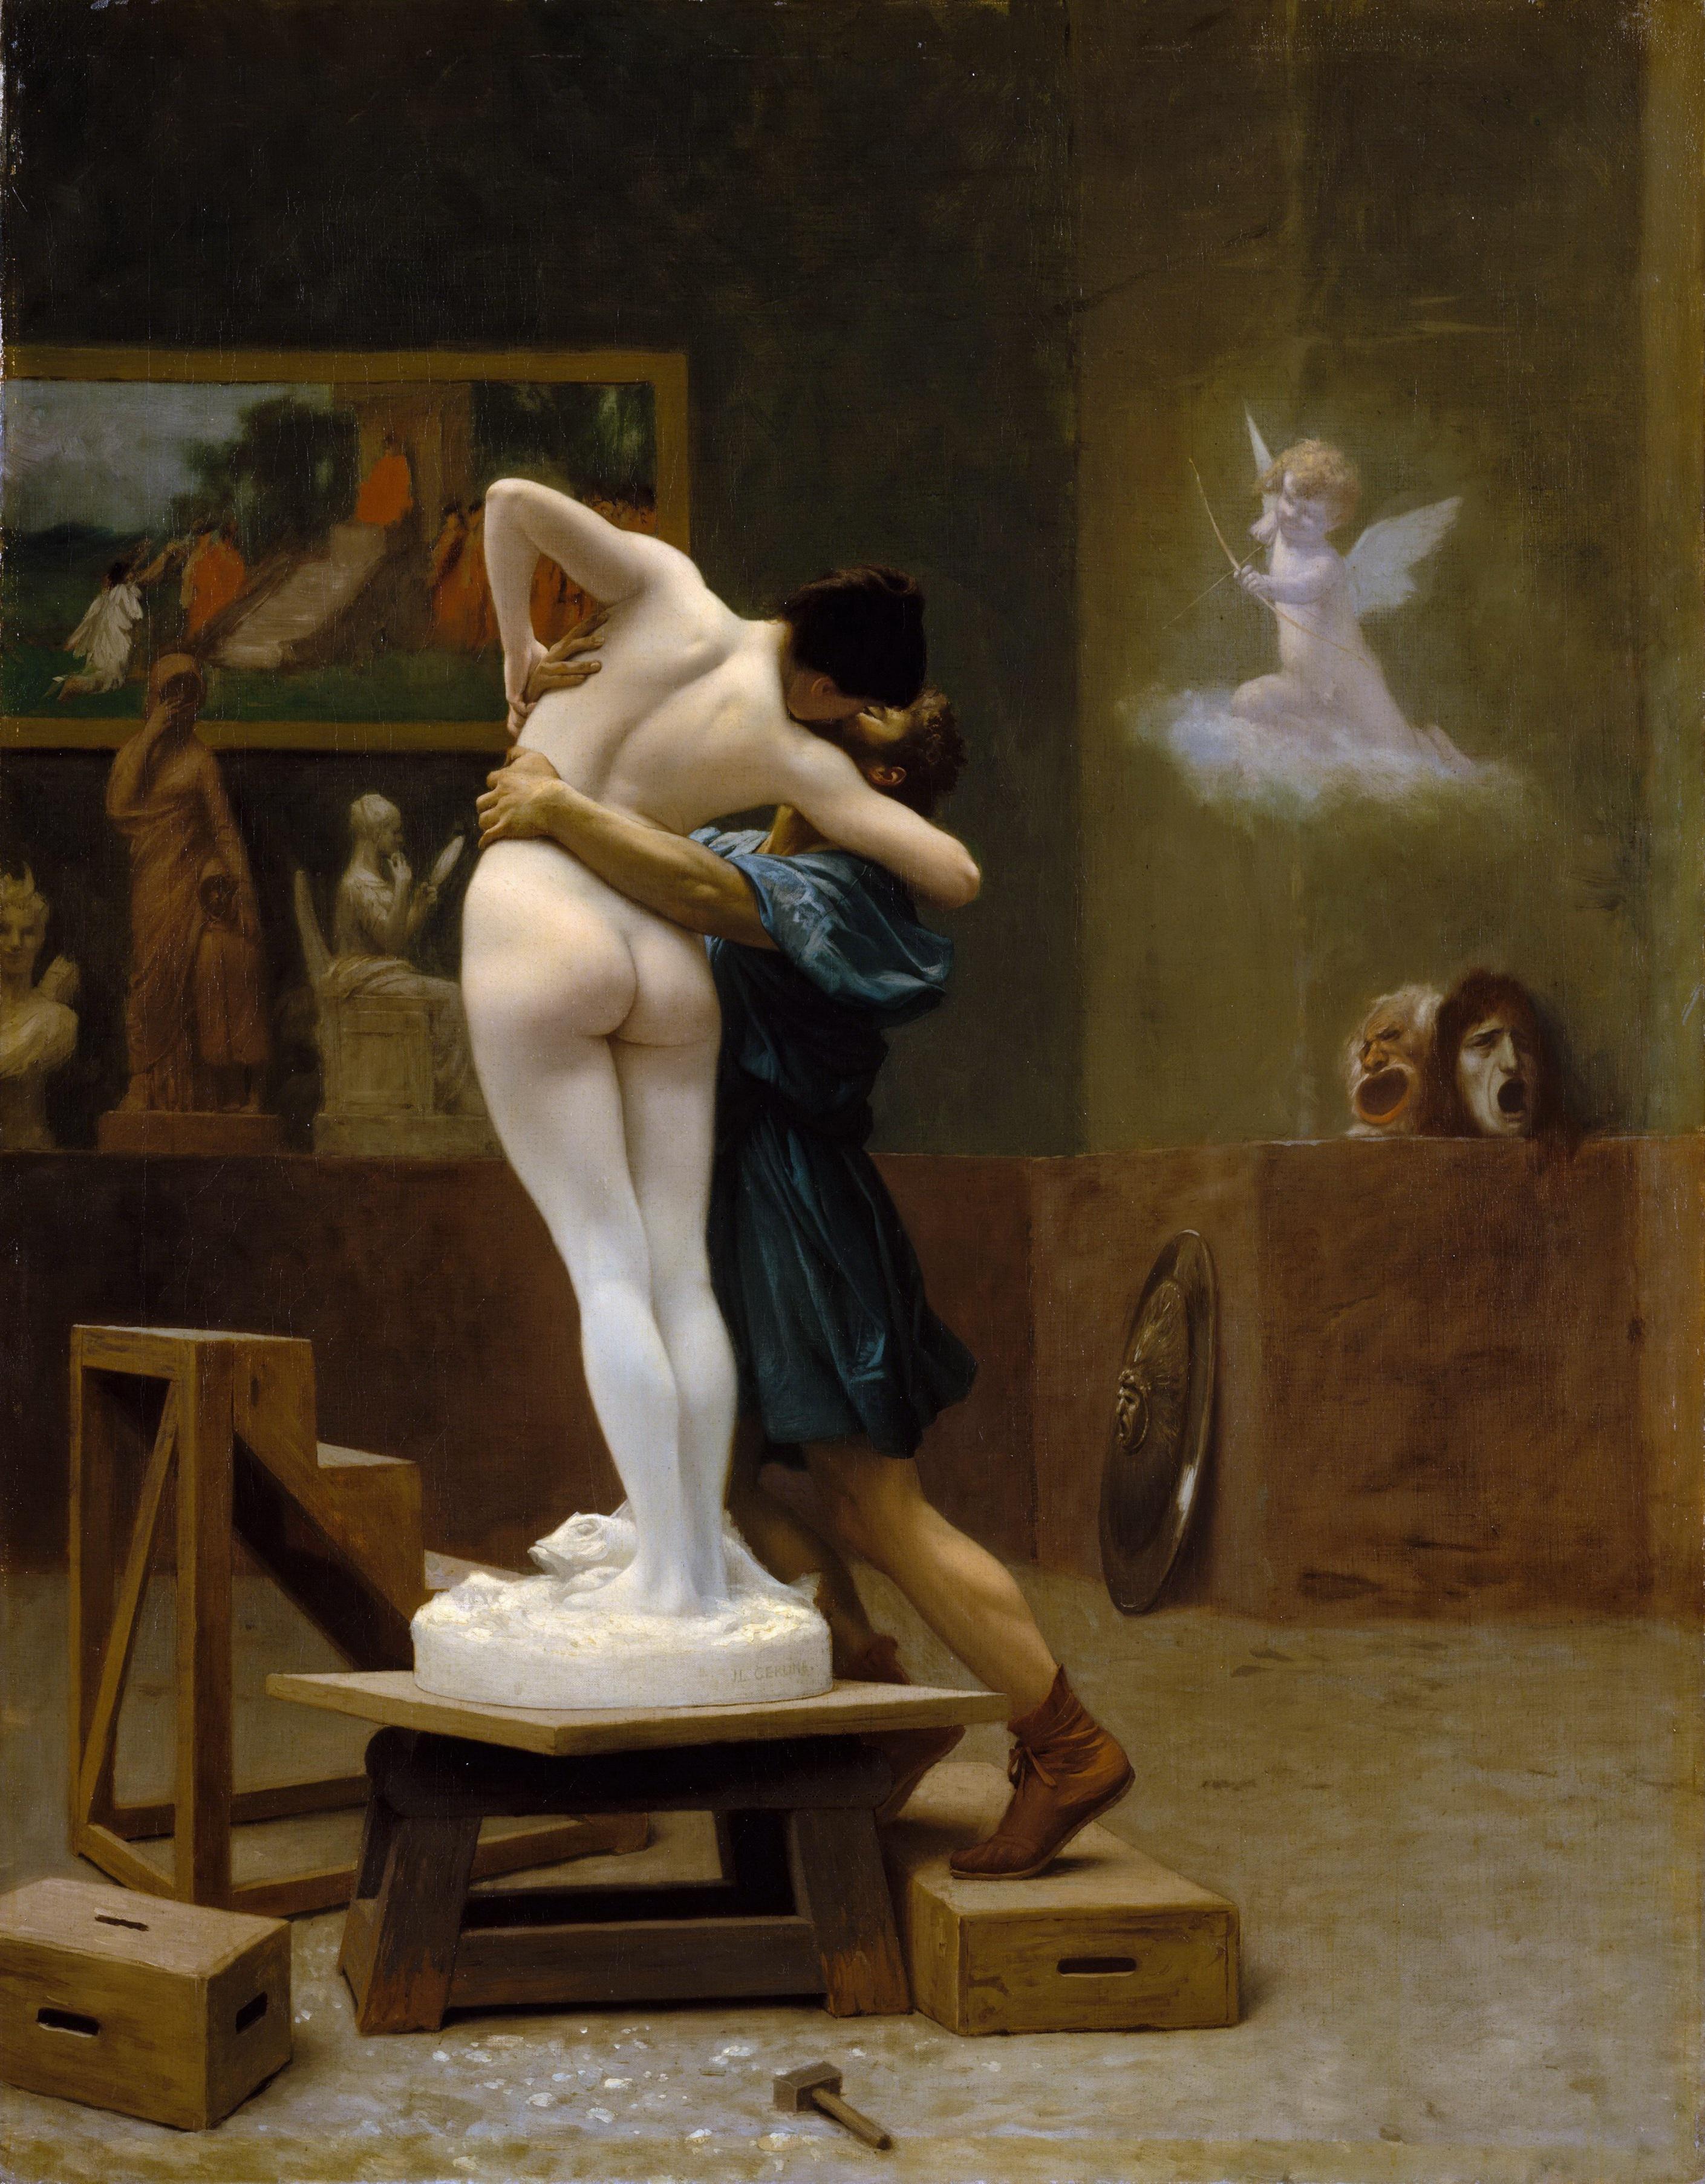 Jean-Leon Gerome, 1824-1904. Пигмалион и Галатея. ок.1890. Нью-Йорк, Метрополитен